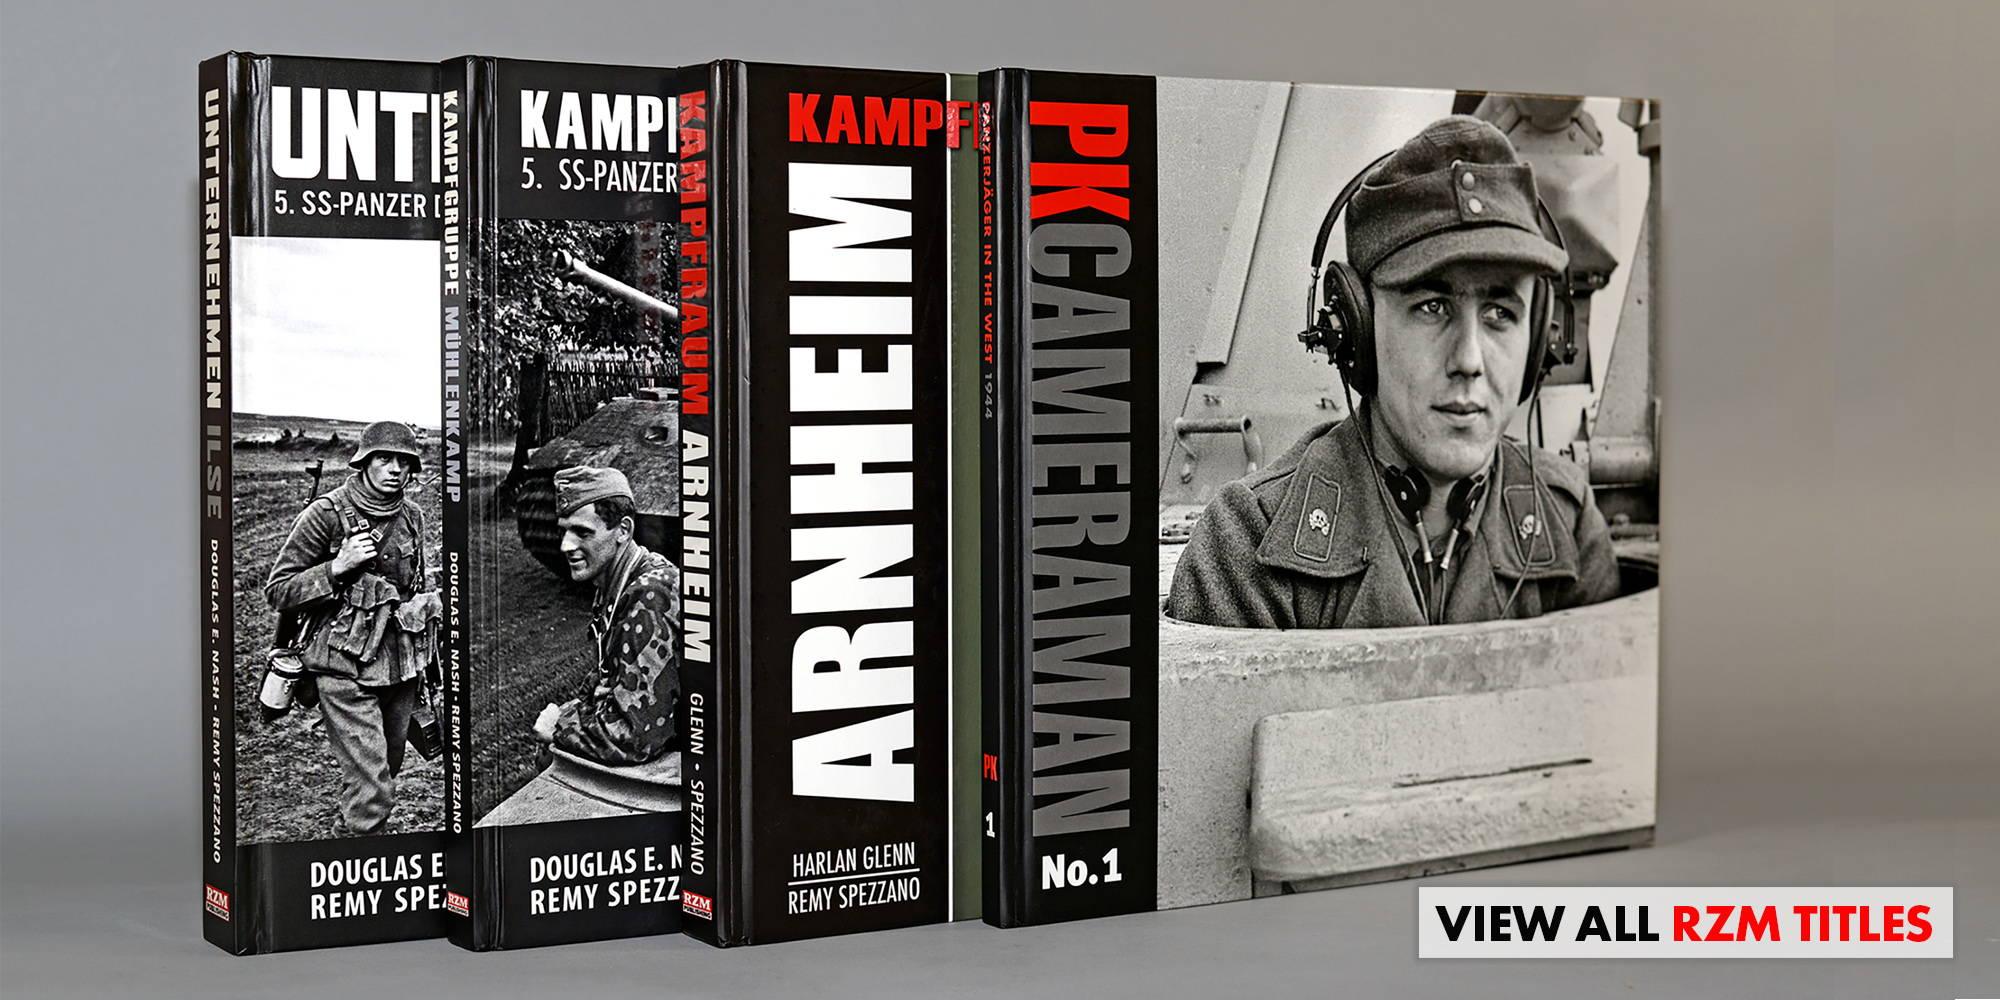 RZM Publishing books Unternehmen Ilse, Kampfgrupppe Mühlenkamp, Kampfraum Arnheim and PK Cameraman